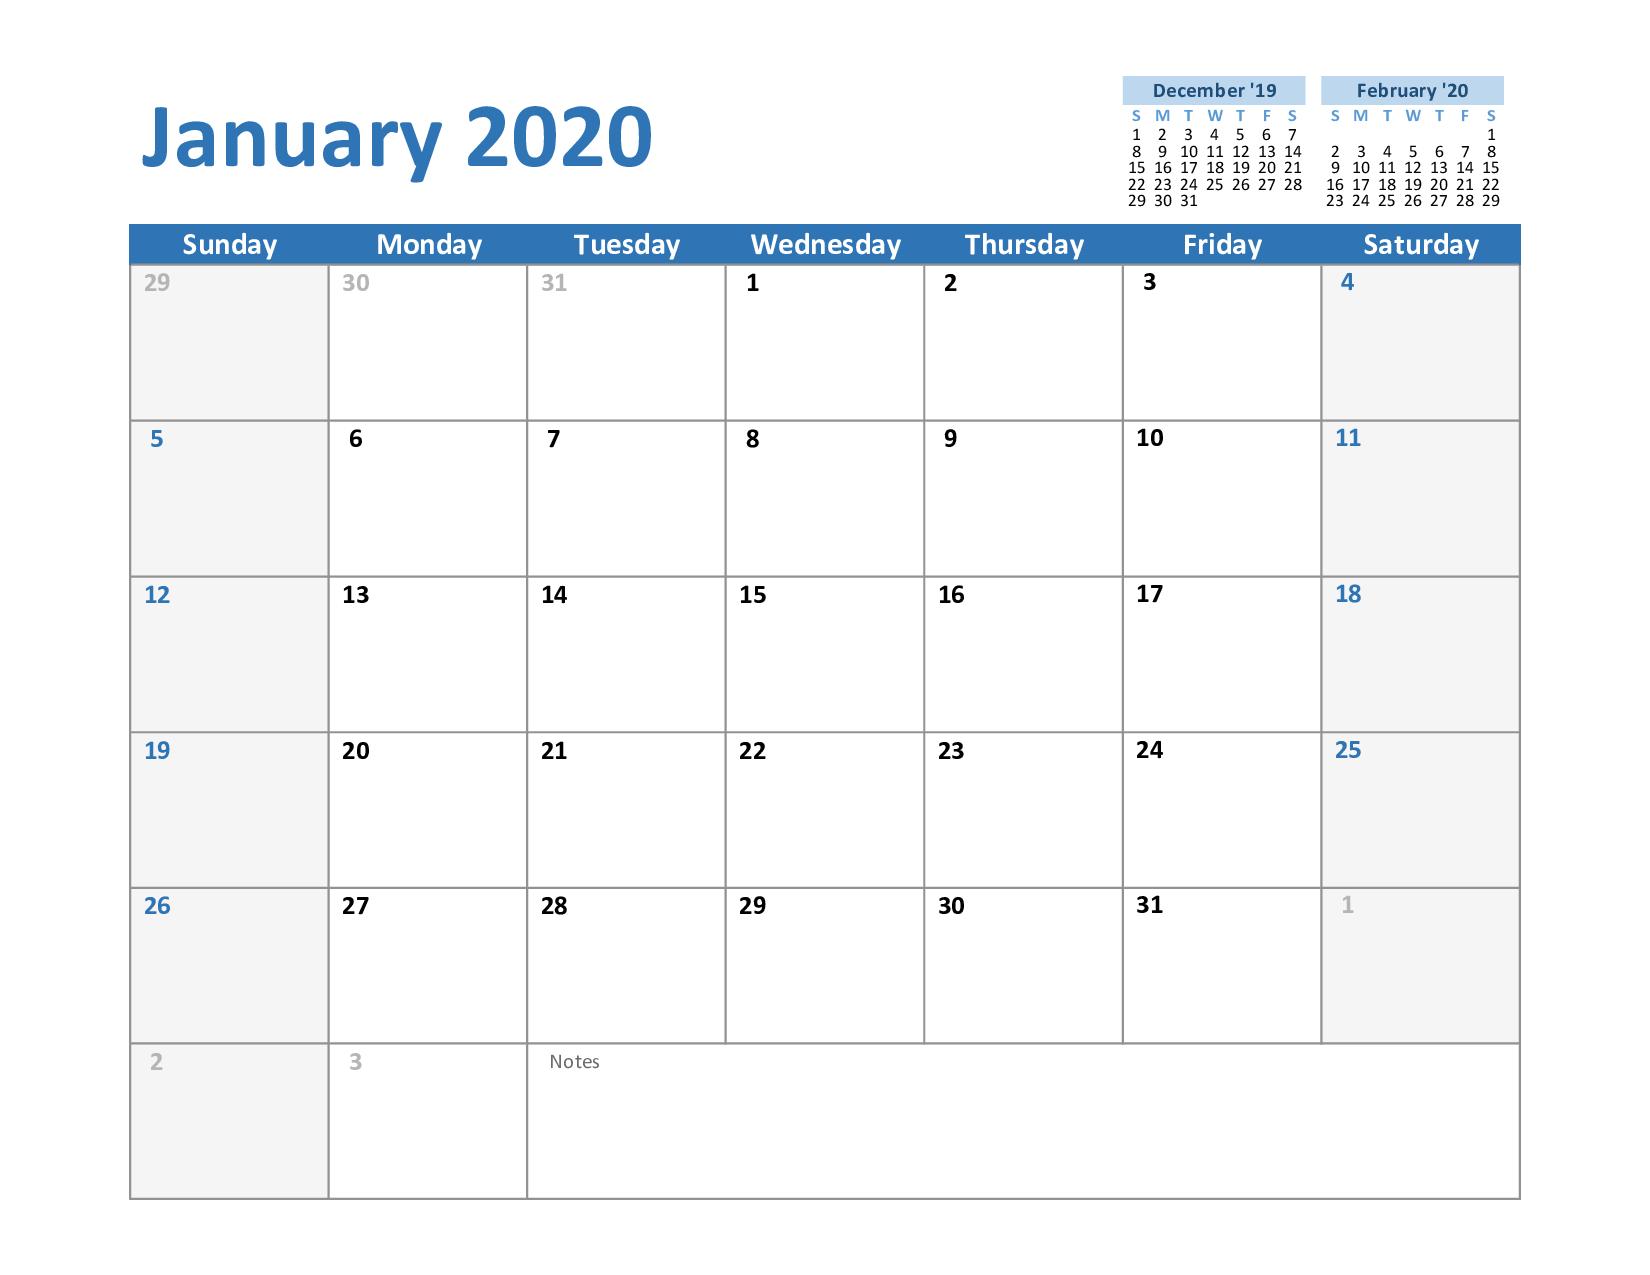 Printable January 2020 Calendar - Free Blank Templates